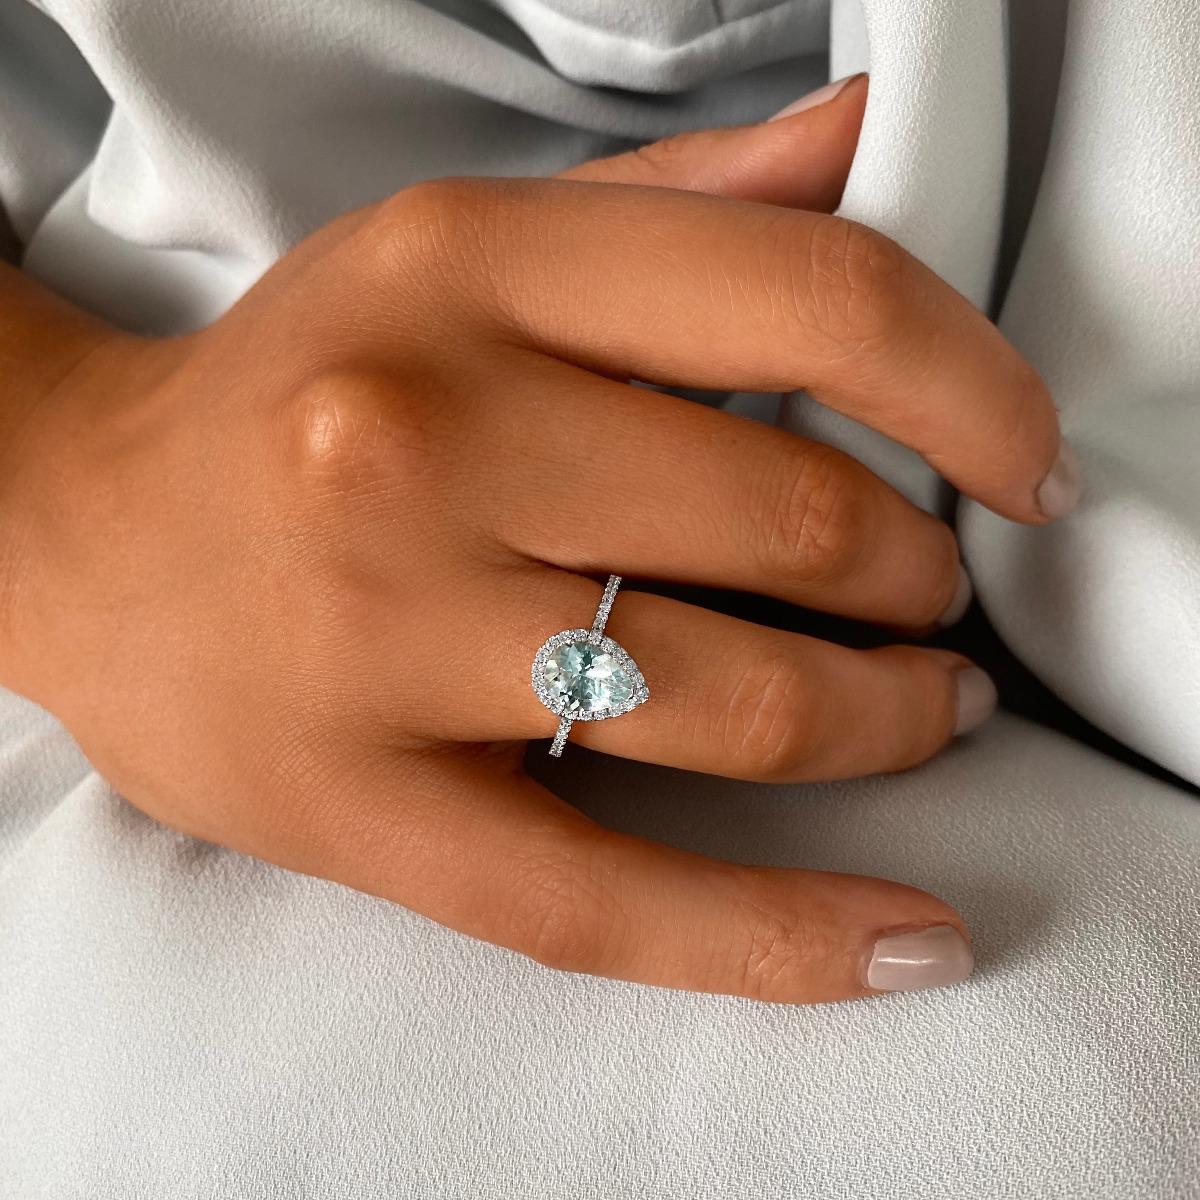 Rosa Mer Collection 1.47ct Pear Cut Aquamarine & Diamond Halo Ring